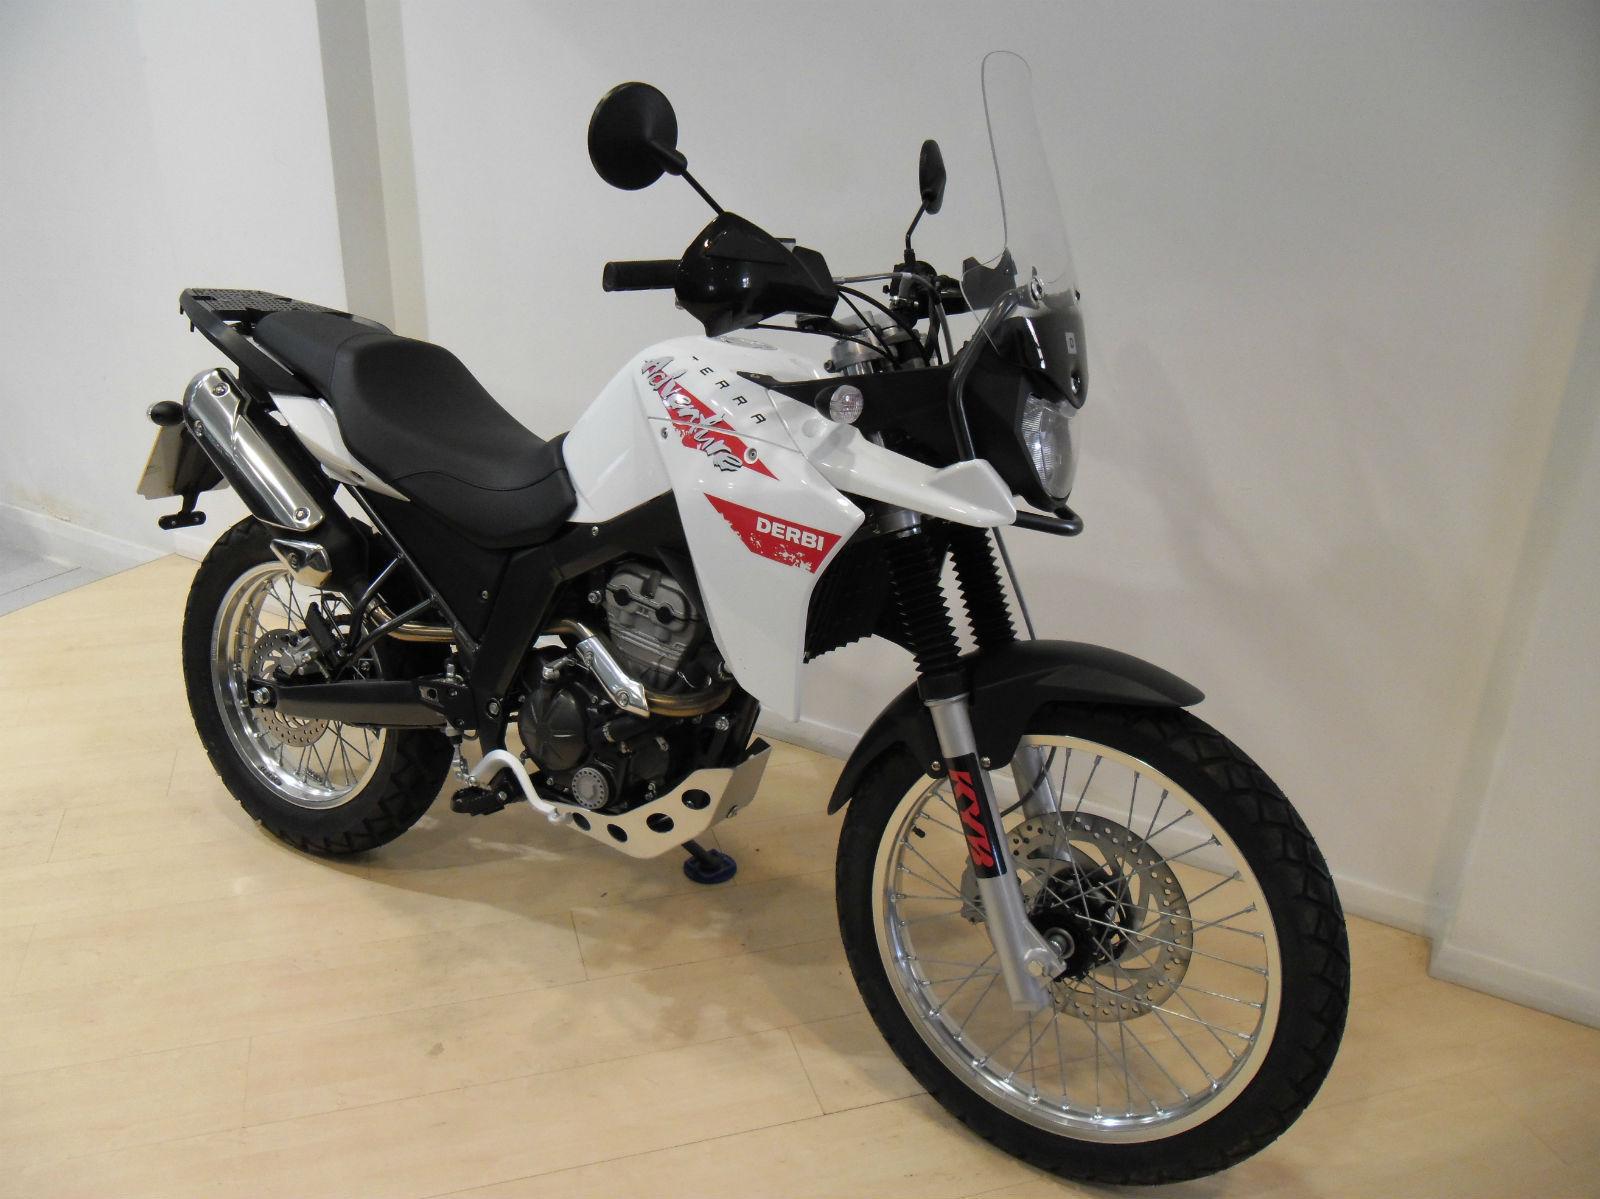 derbi terra 125 adventure 125cc trail enduro motorcycle. Black Bedroom Furniture Sets. Home Design Ideas